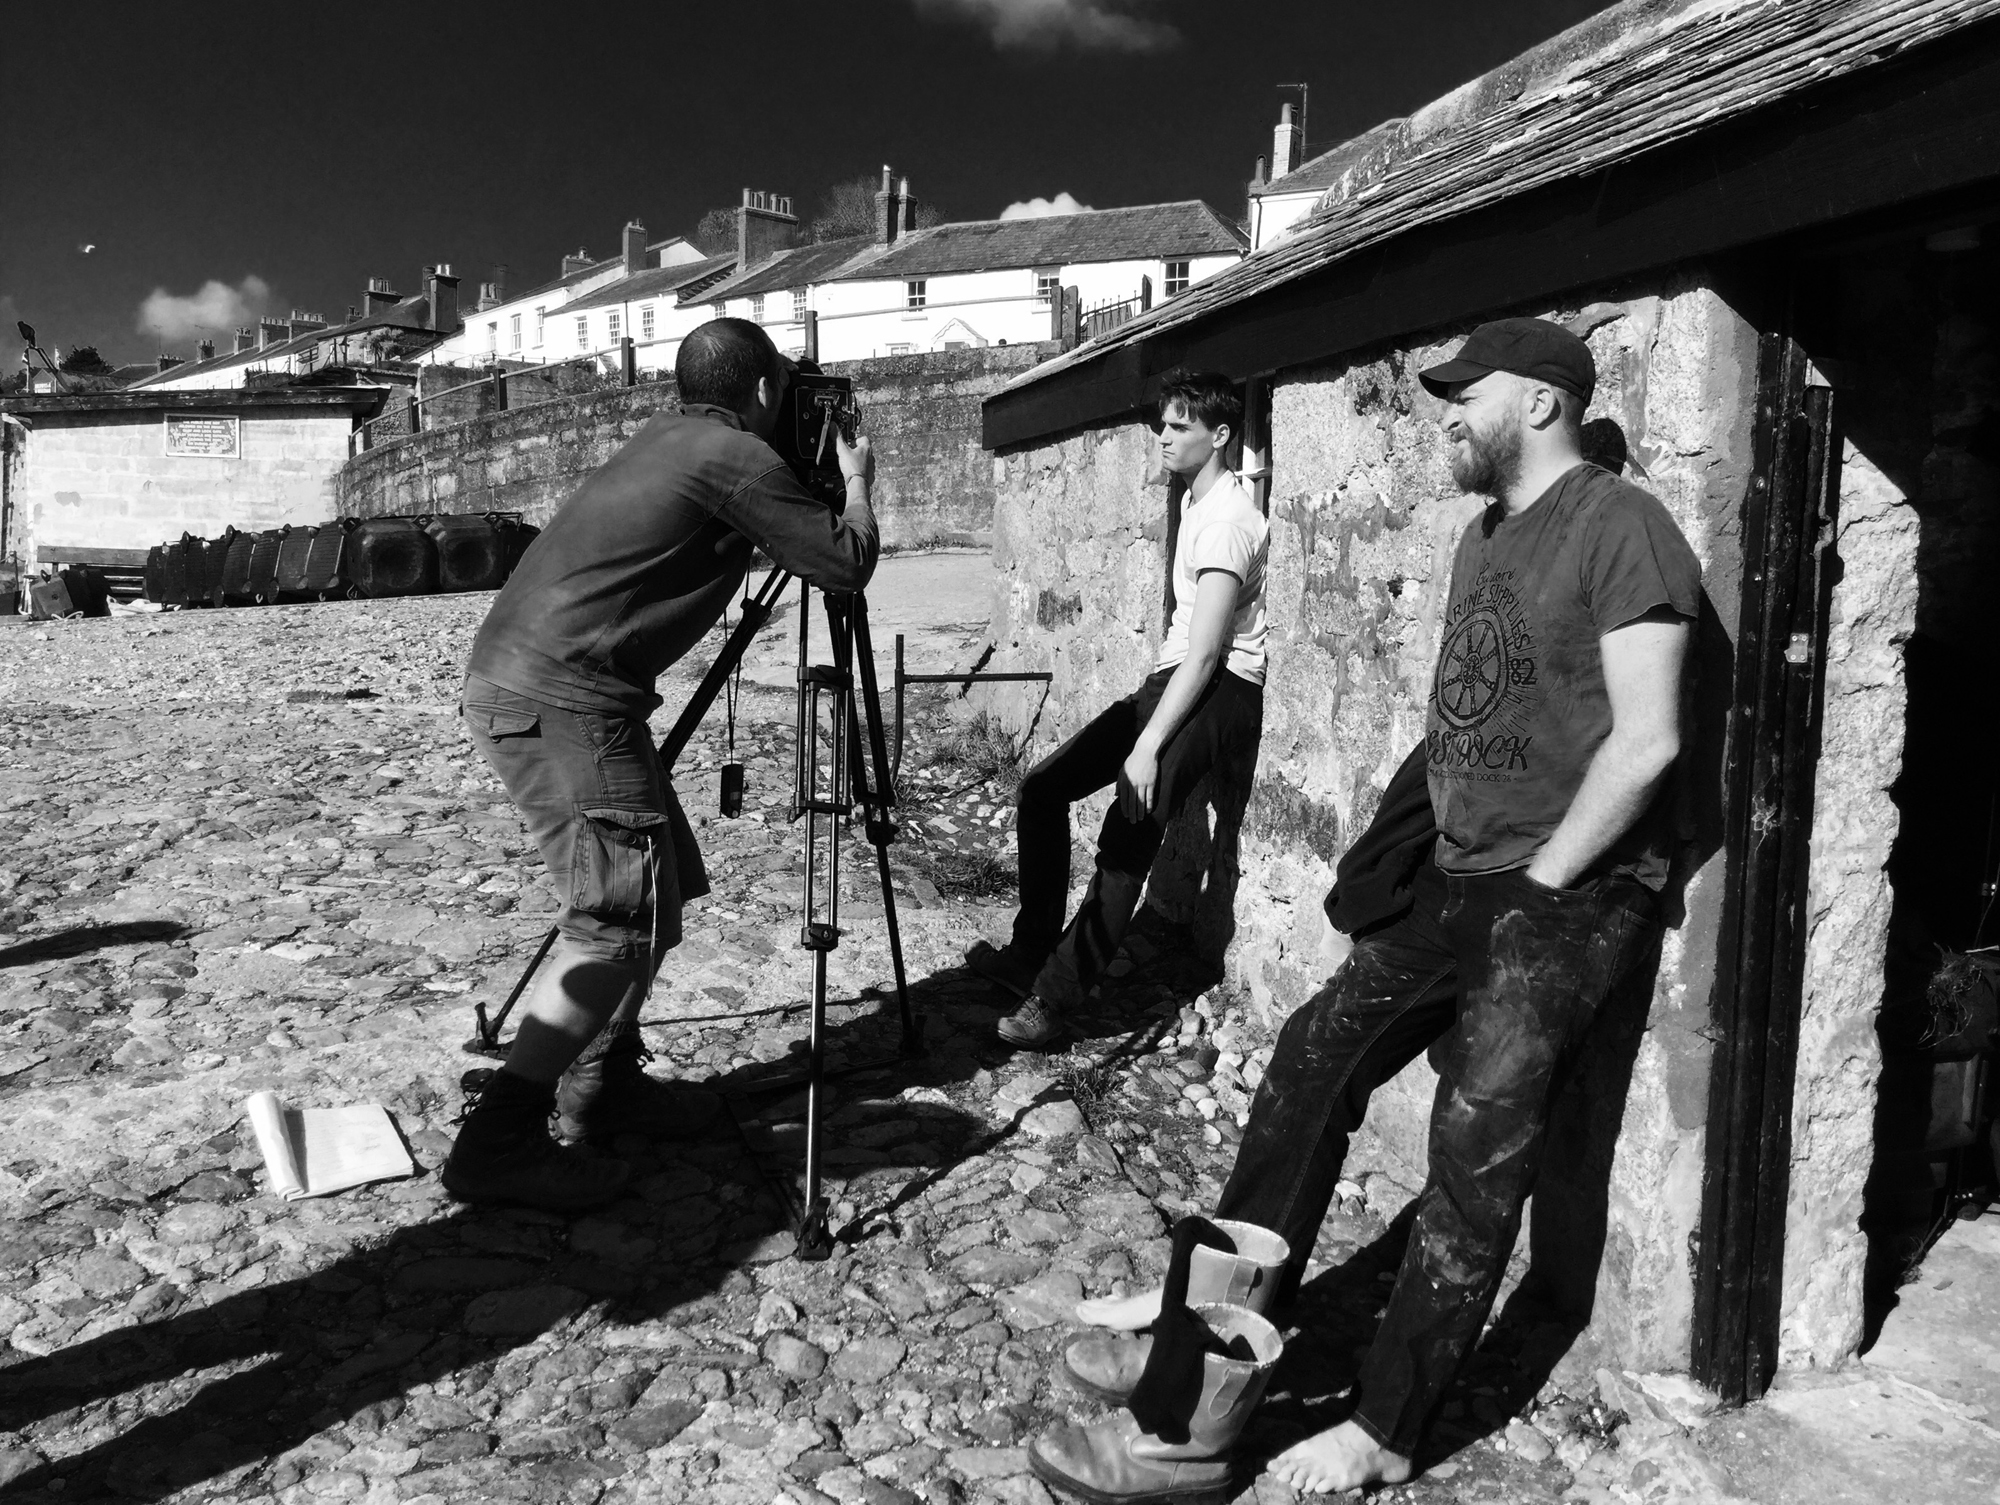 On set in Charlestown. (l-r): Mark Jenkin, Isaac Woodvine, Edward Rowe. Photo: Early Day Films